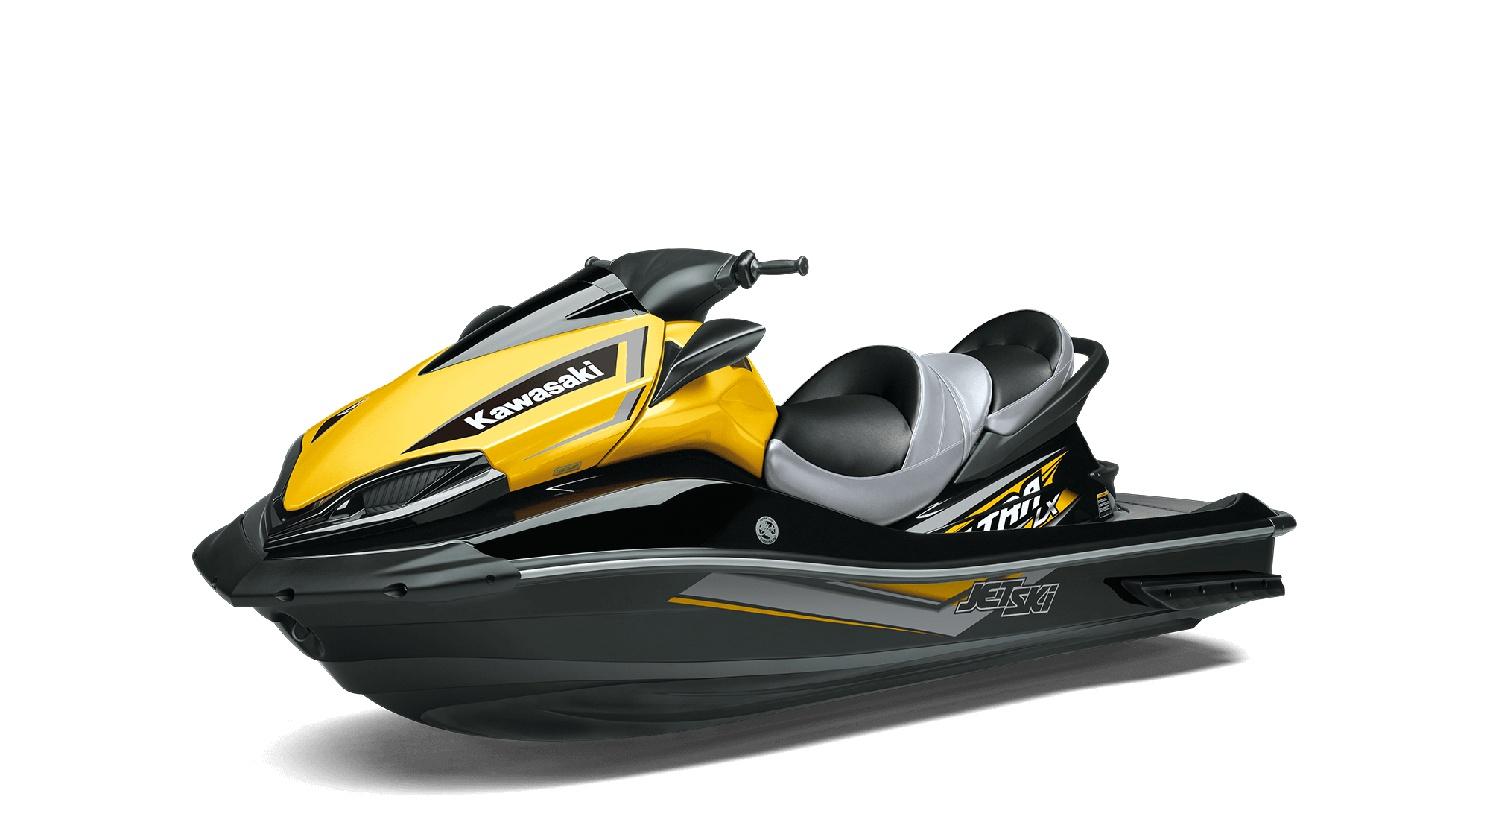 2020 Kawasaki JET SKI ULTRA LX Ebony/Pearl Citrus Yellow